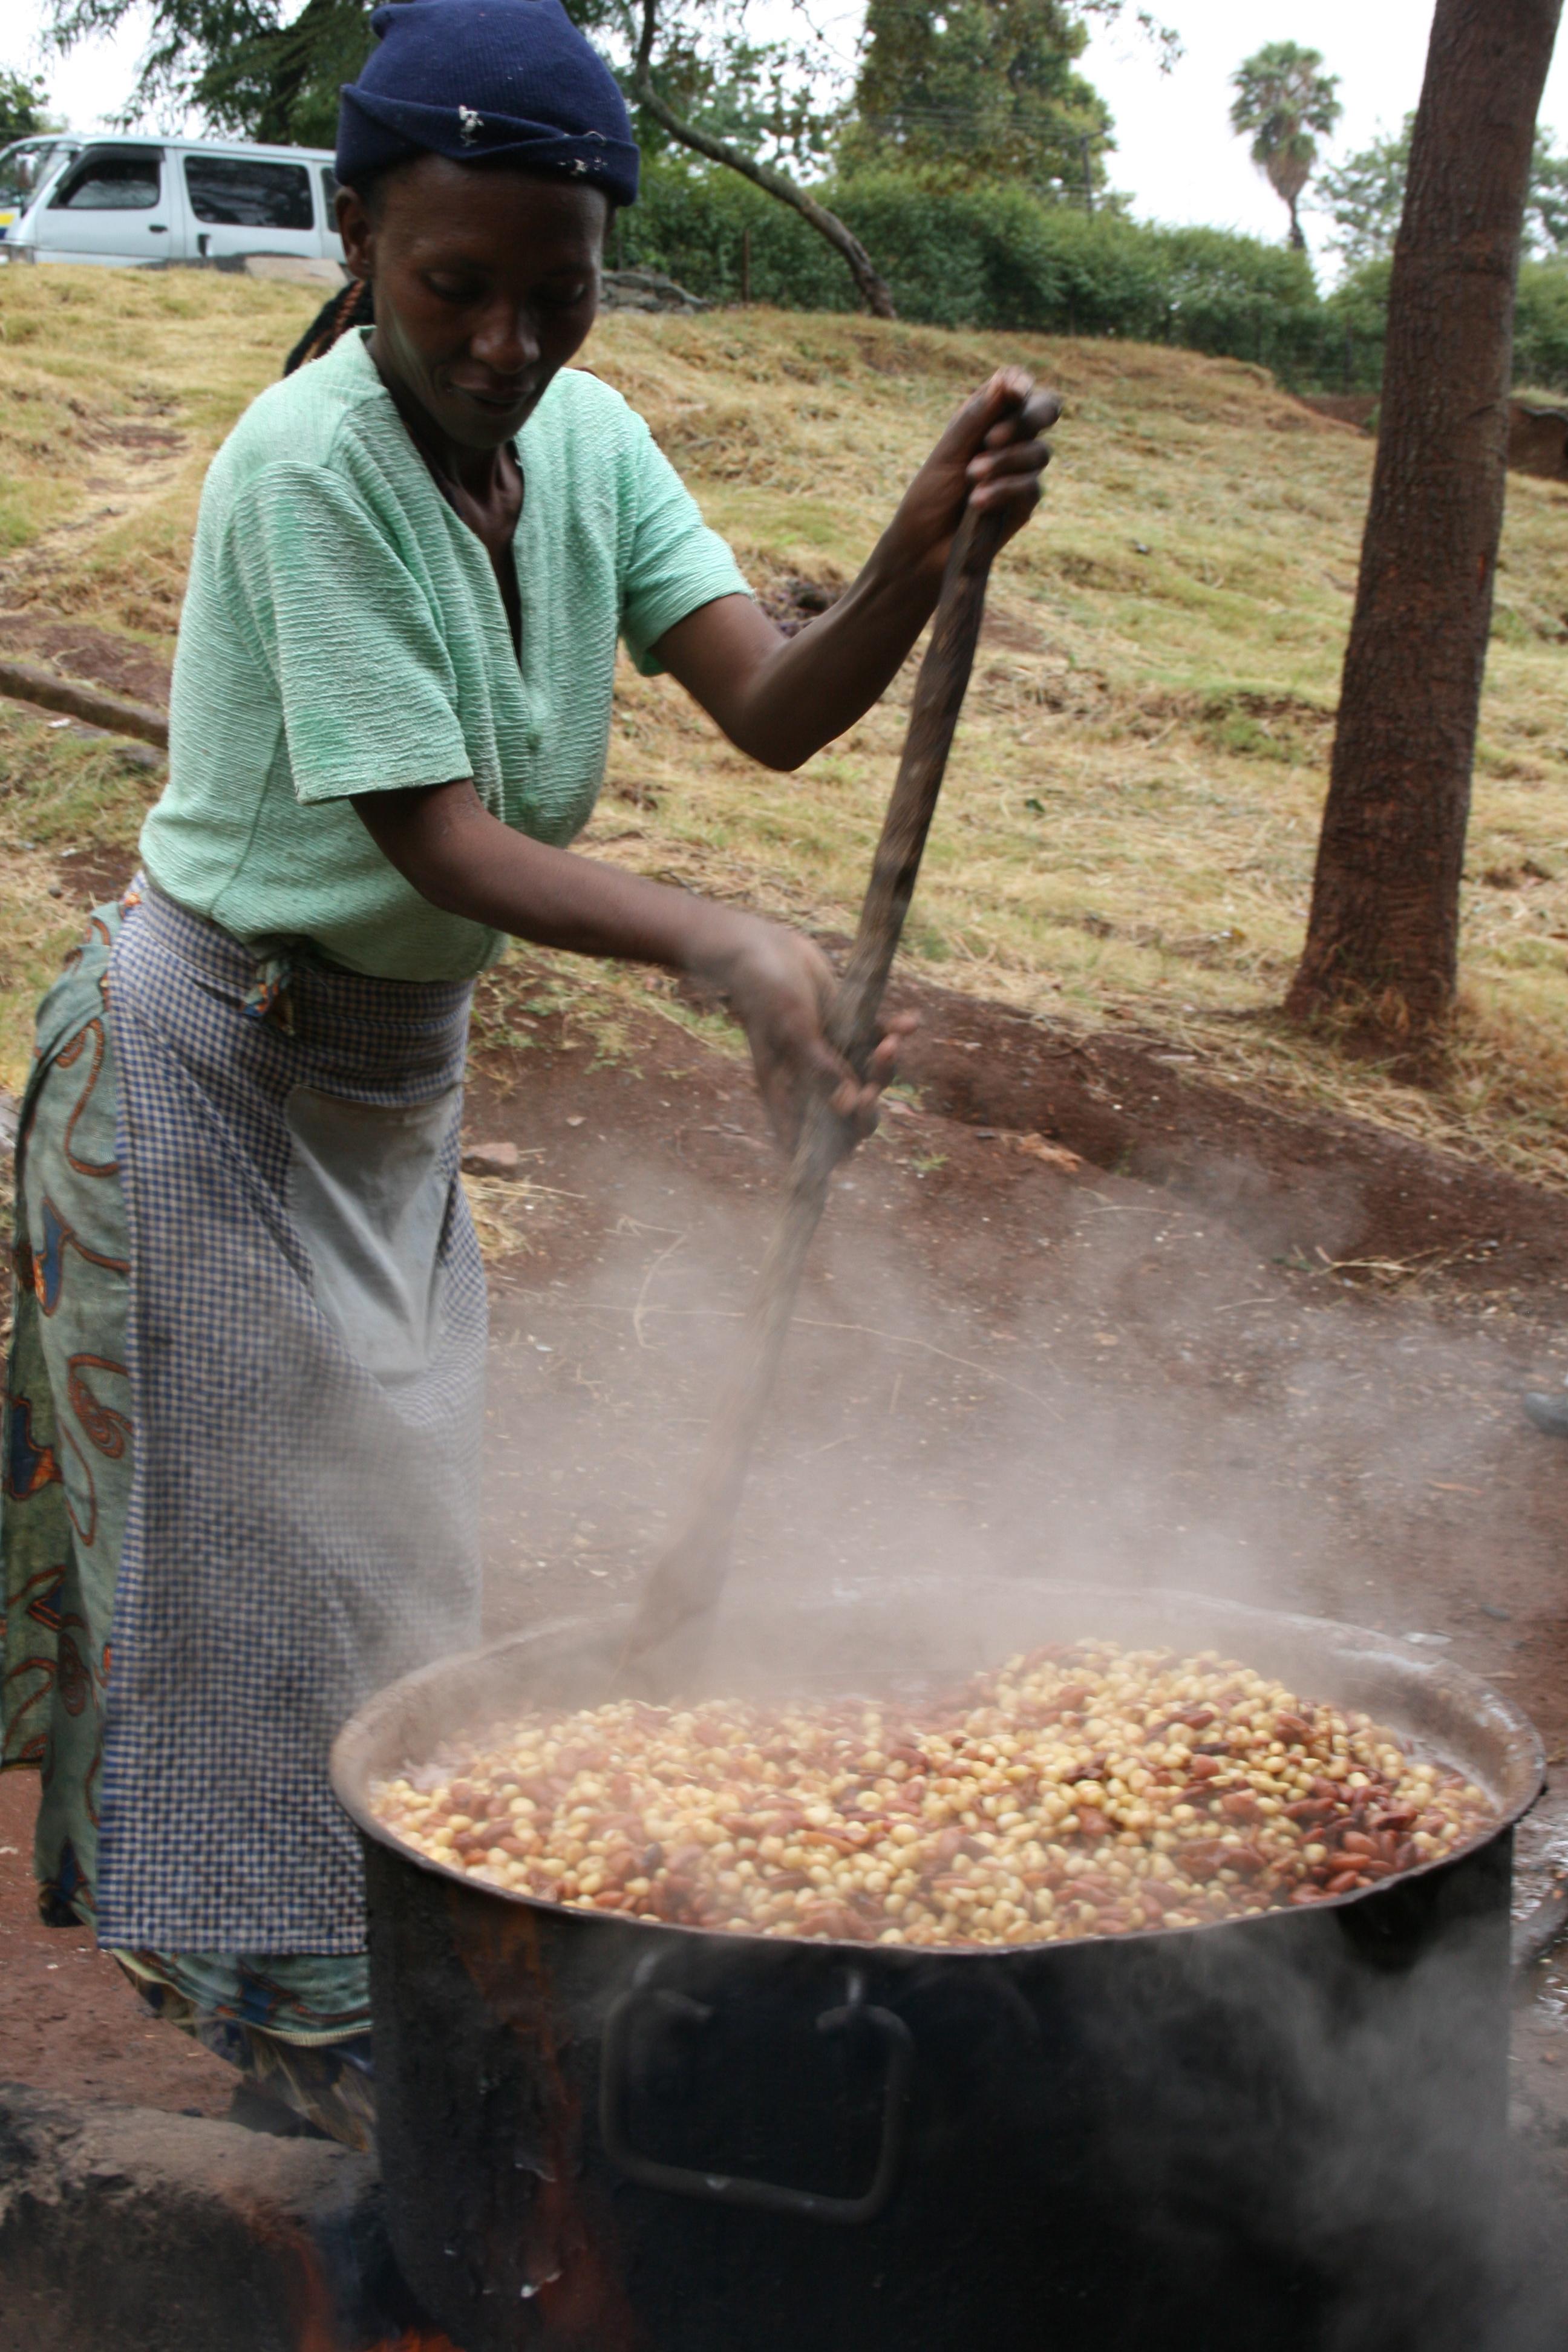 Food service at a school in Kenya.